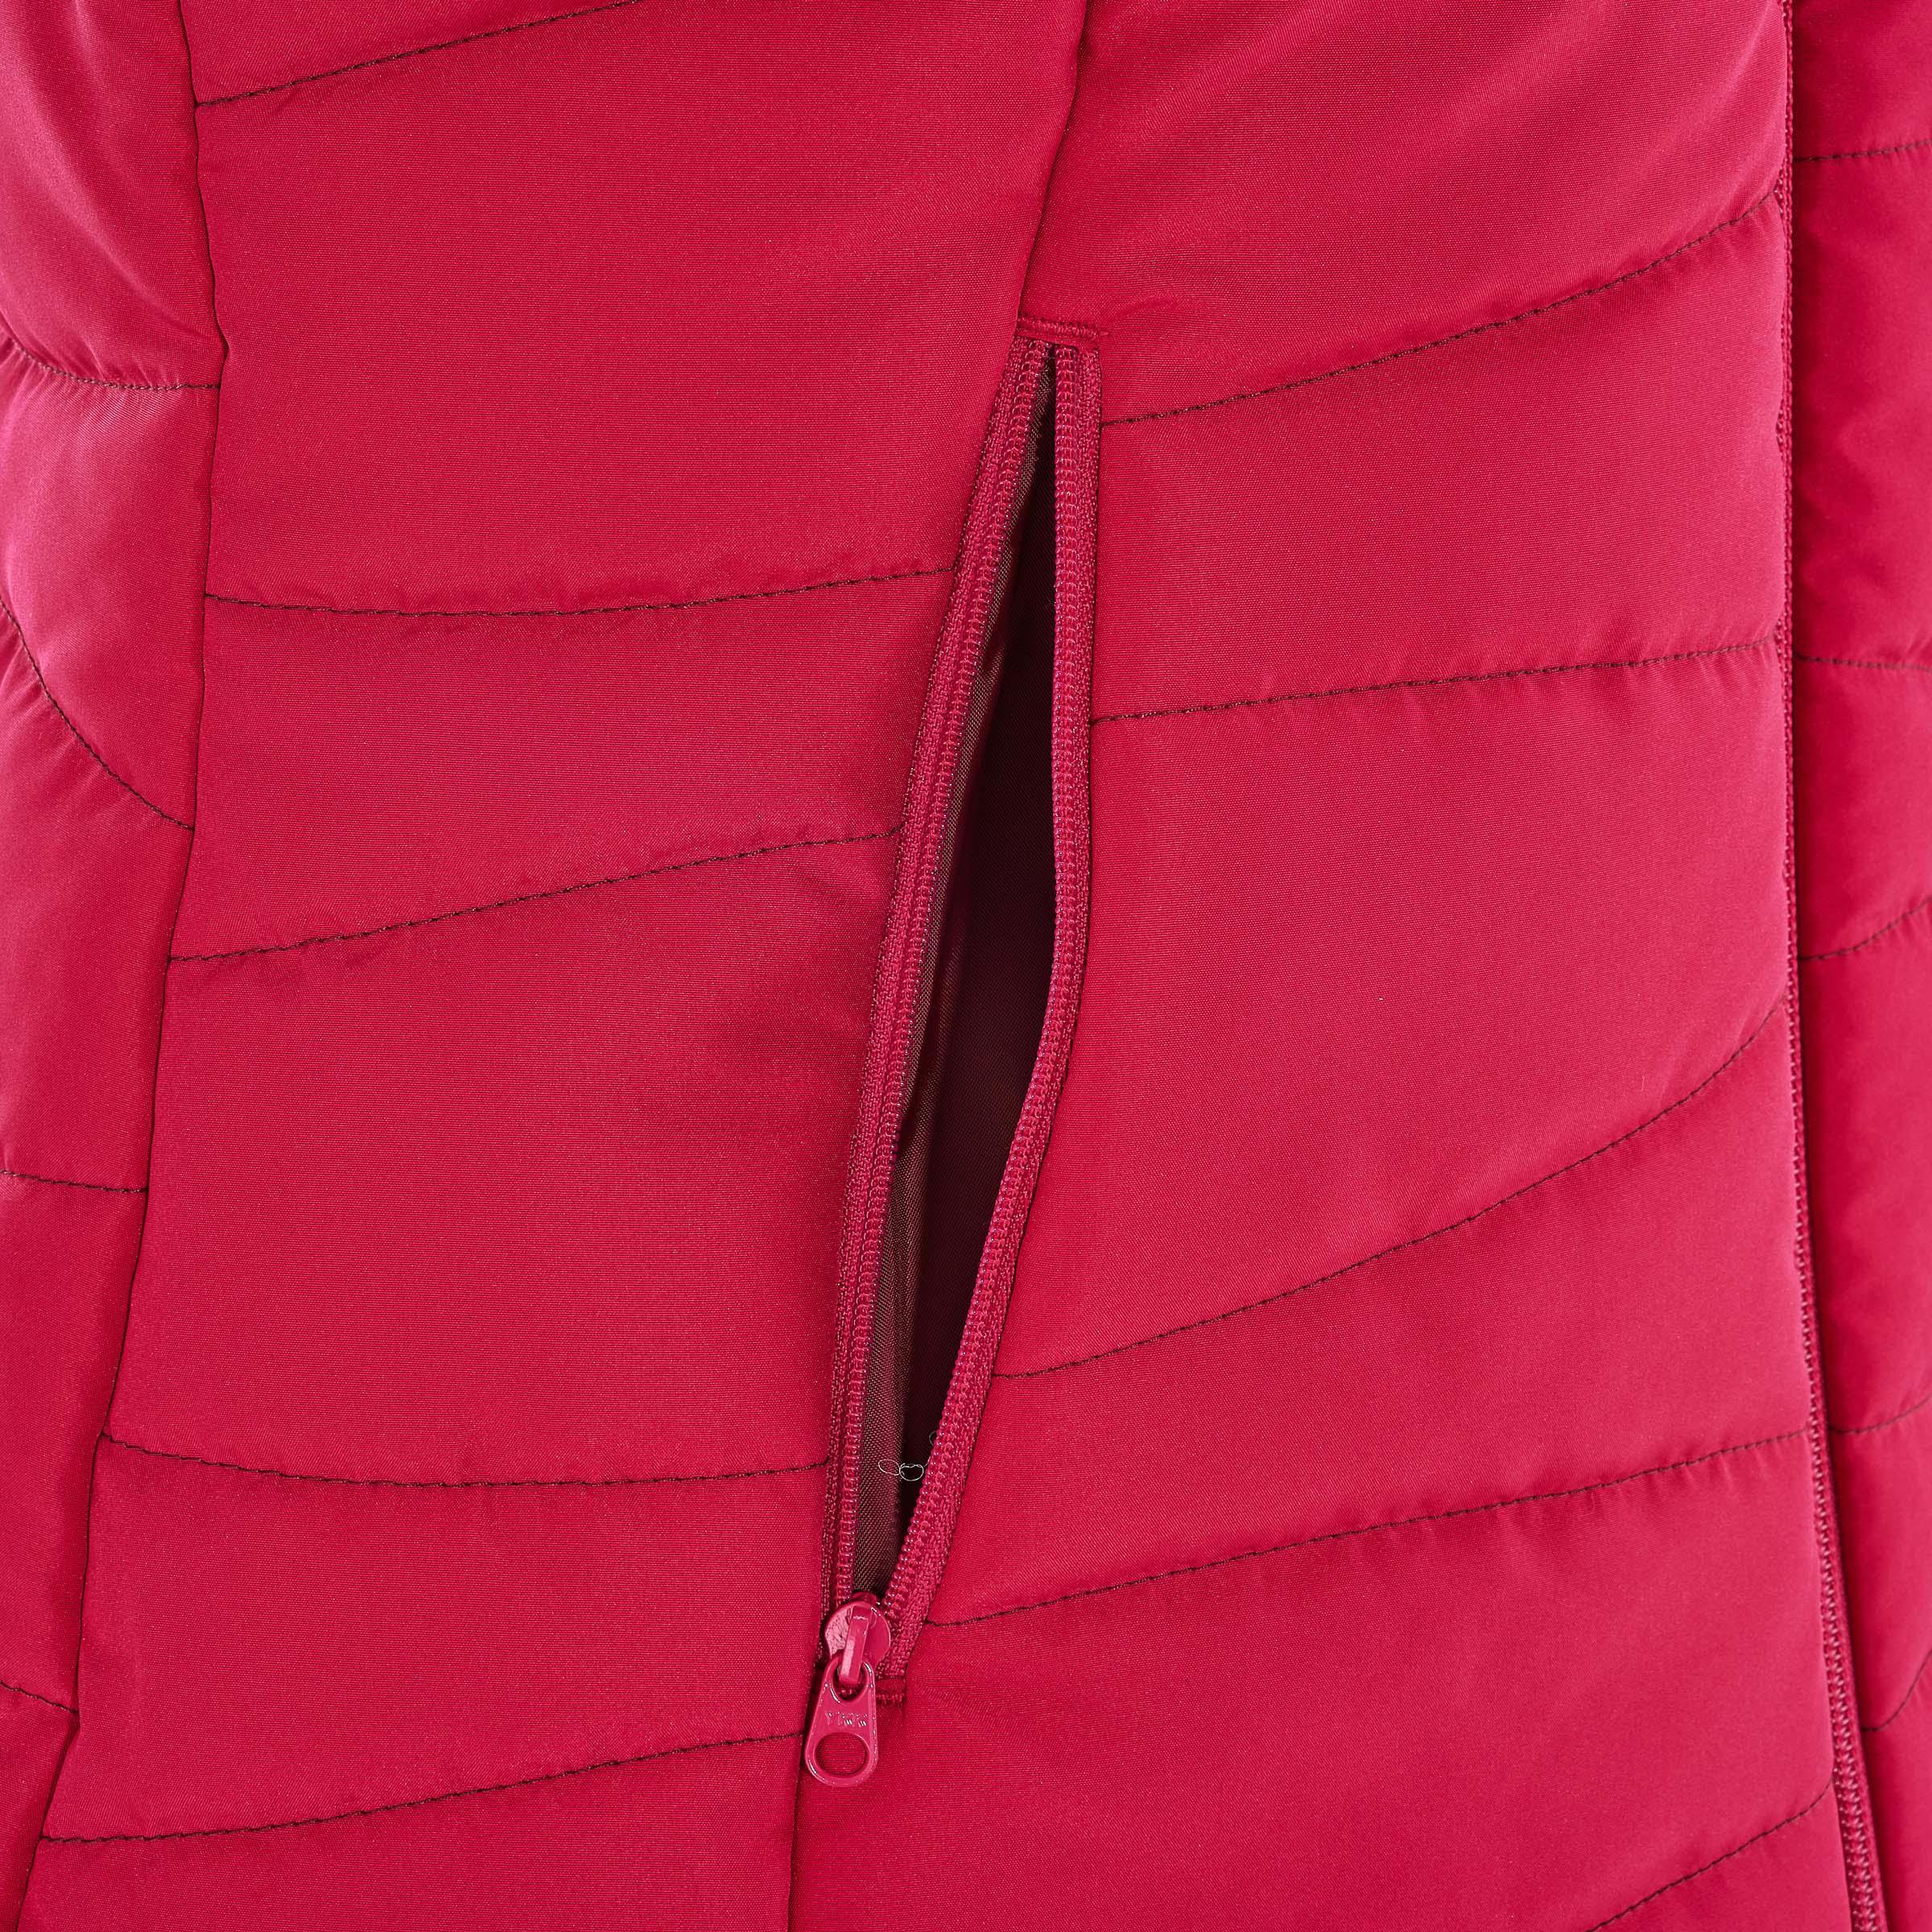 NH100 Women's Nature Hiking Gilet (Sleeveless Padded Jacket) - Pink